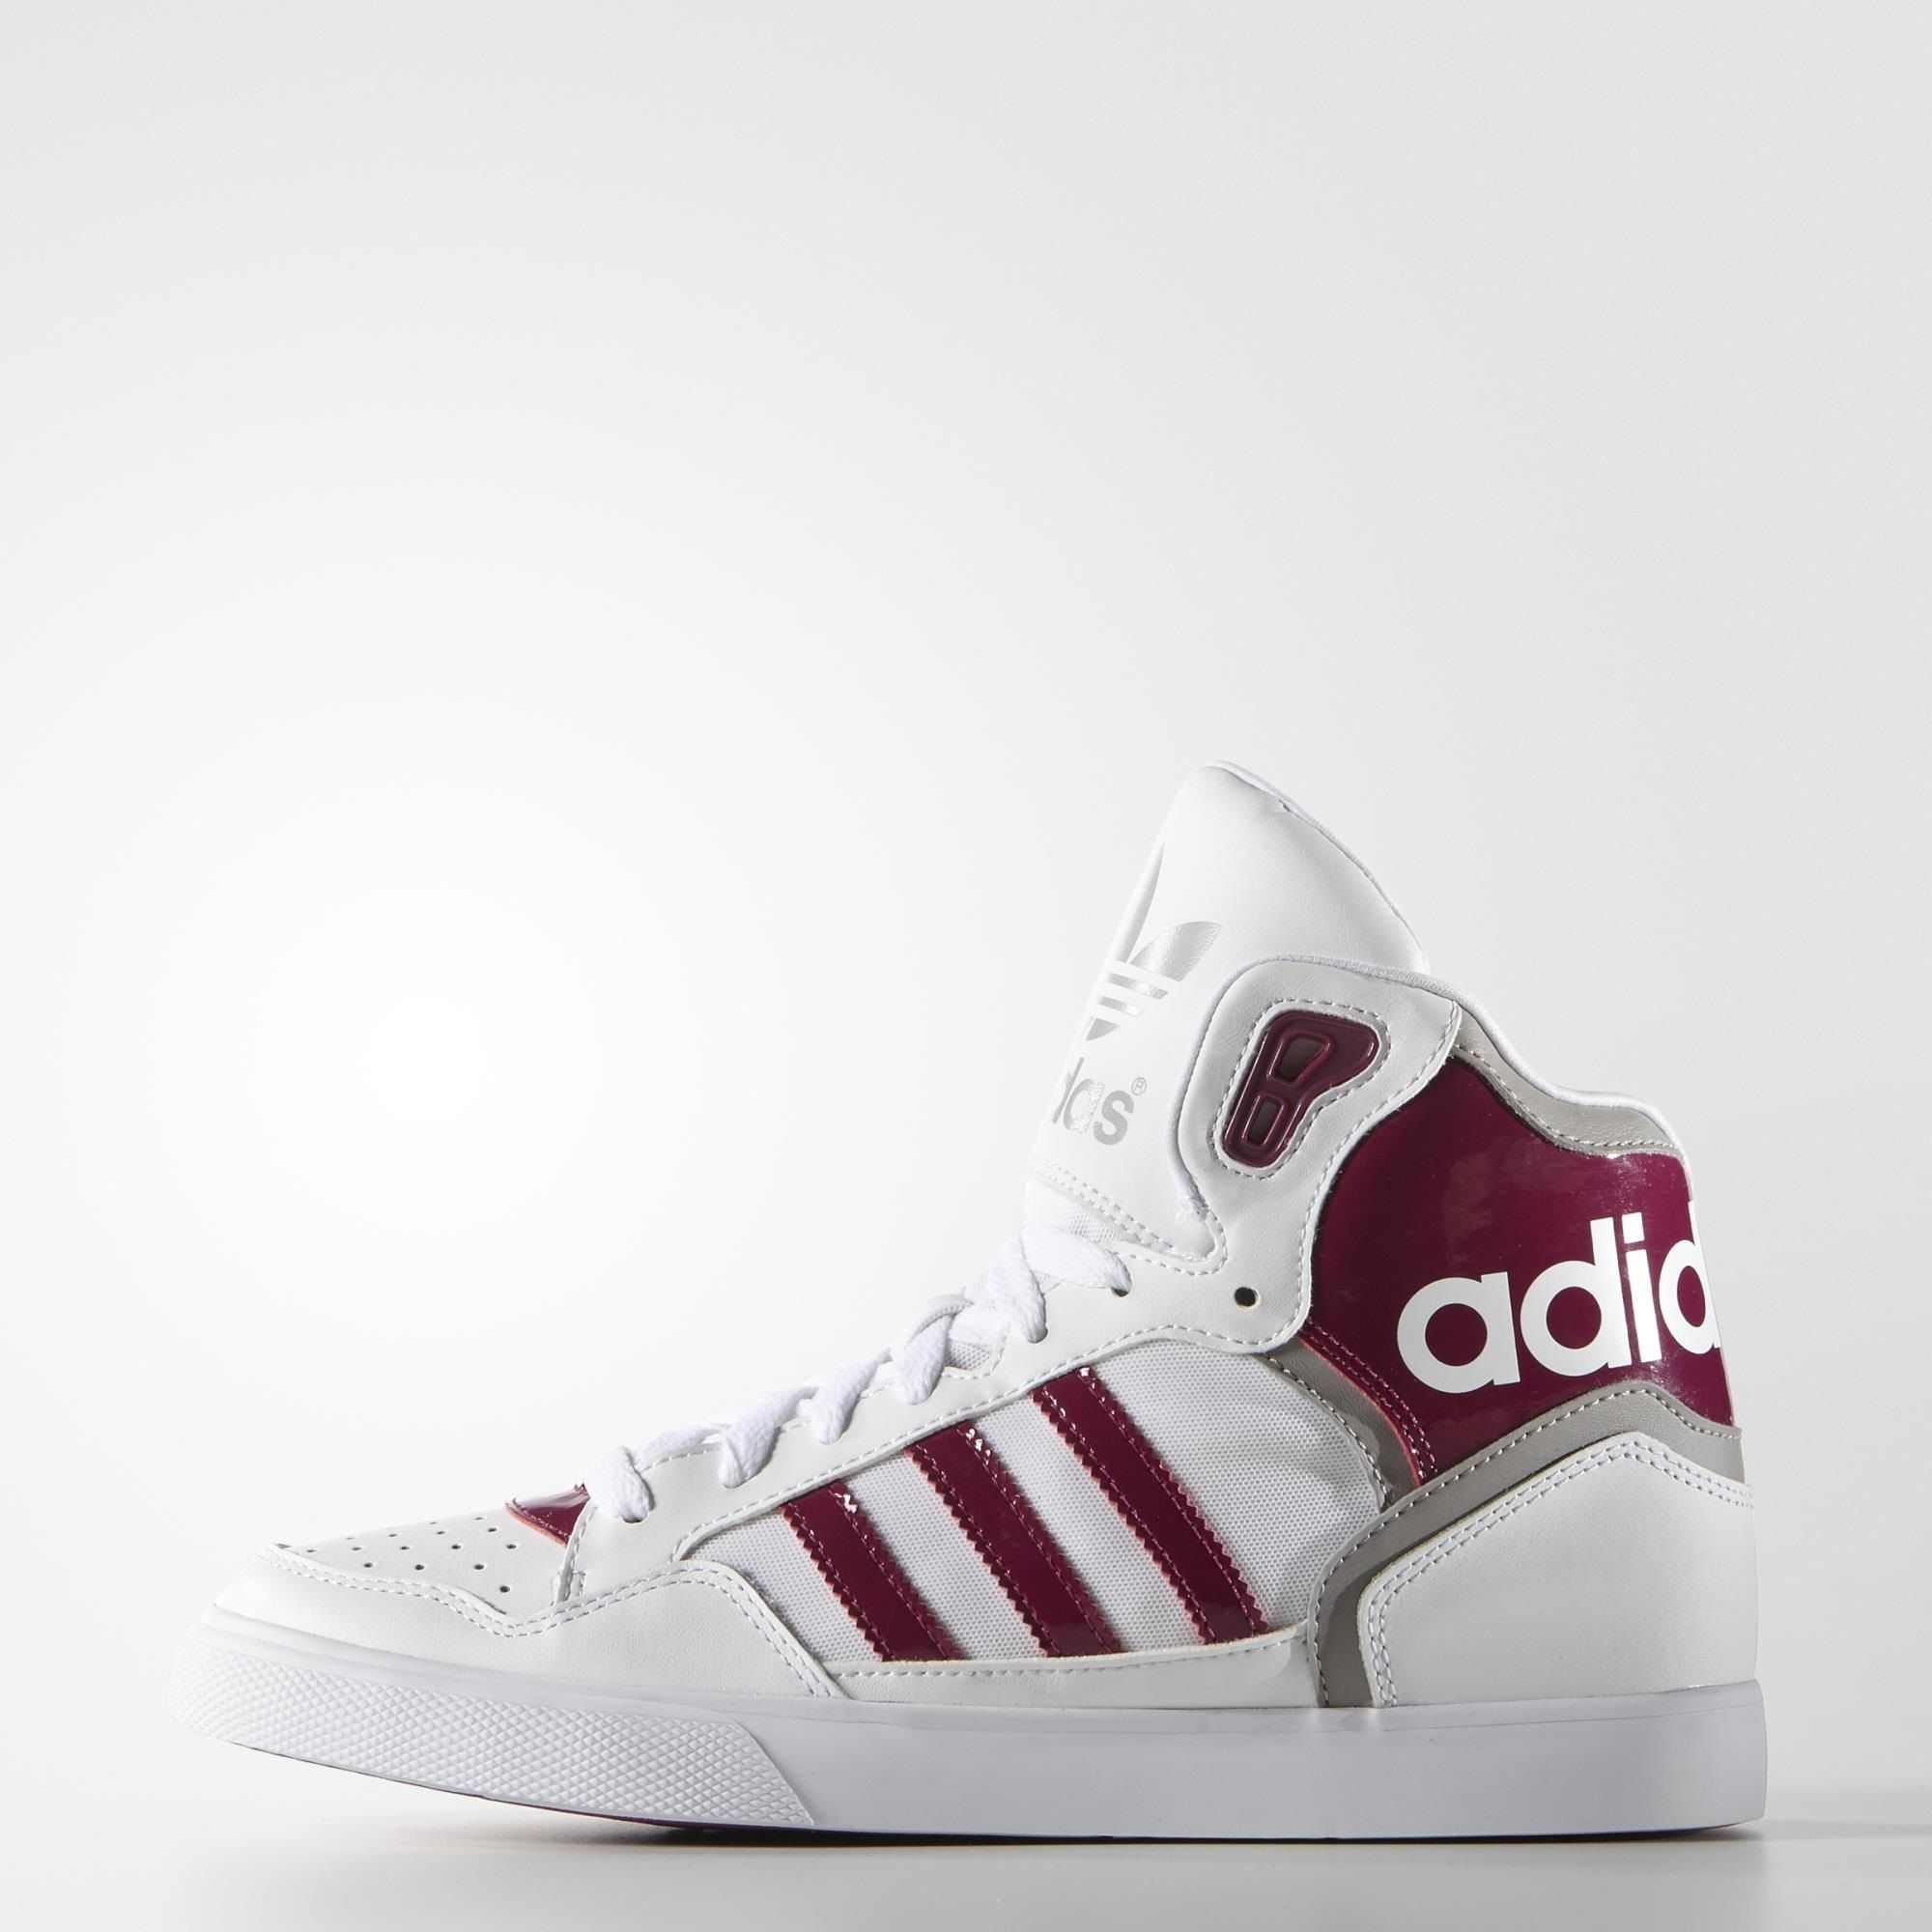 new adidas shoes for girls with the sunset on them adidas gazelle kids 13 saddle